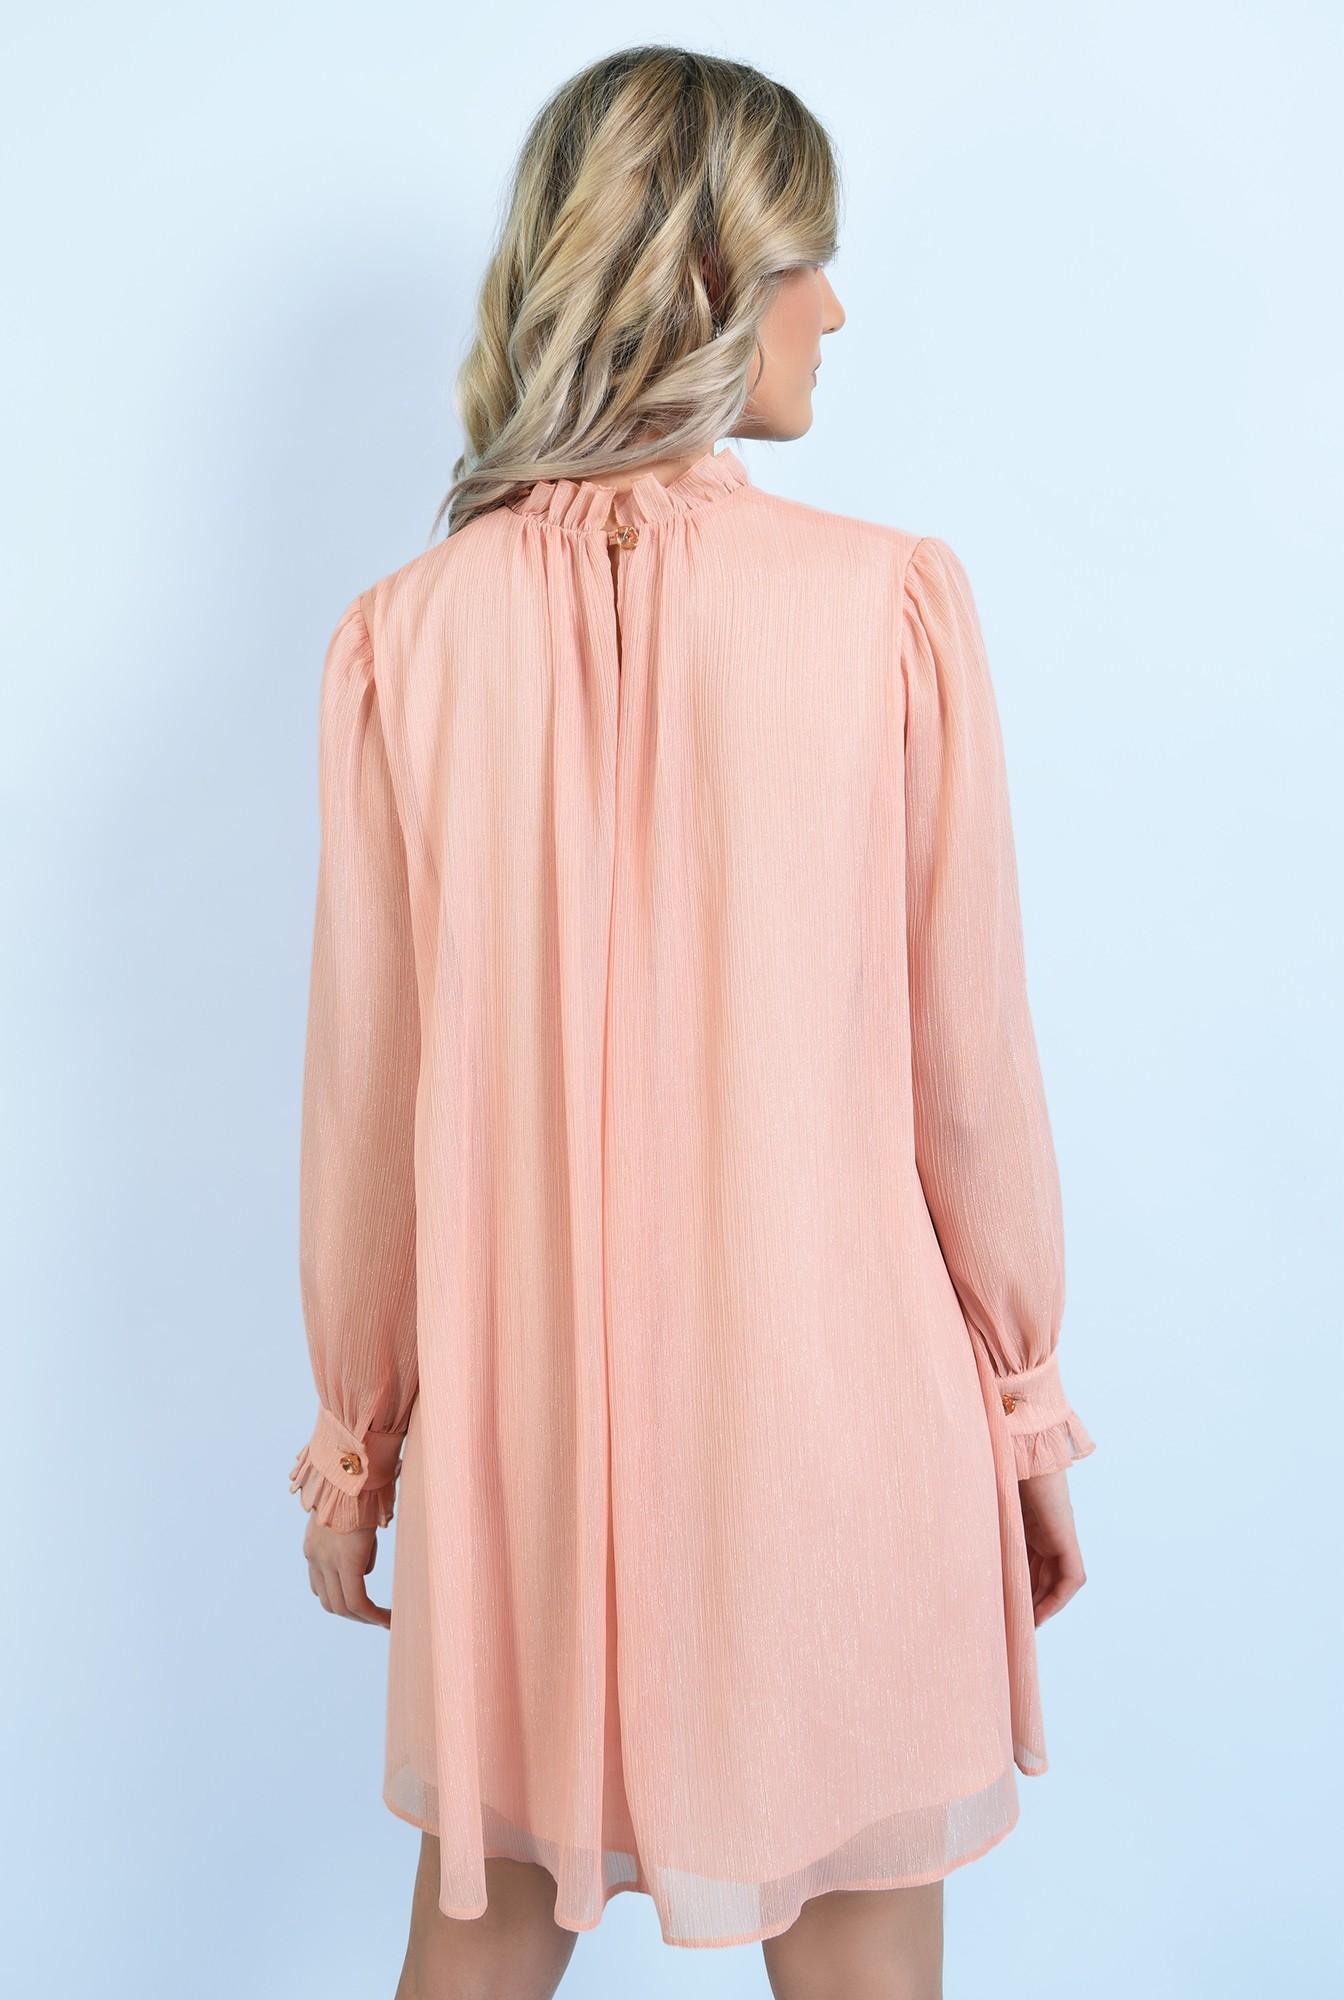 1 - 360 -  rochie scurta, eleganta, evazata, din sifon creponat, cu fir, nasture bijuterie